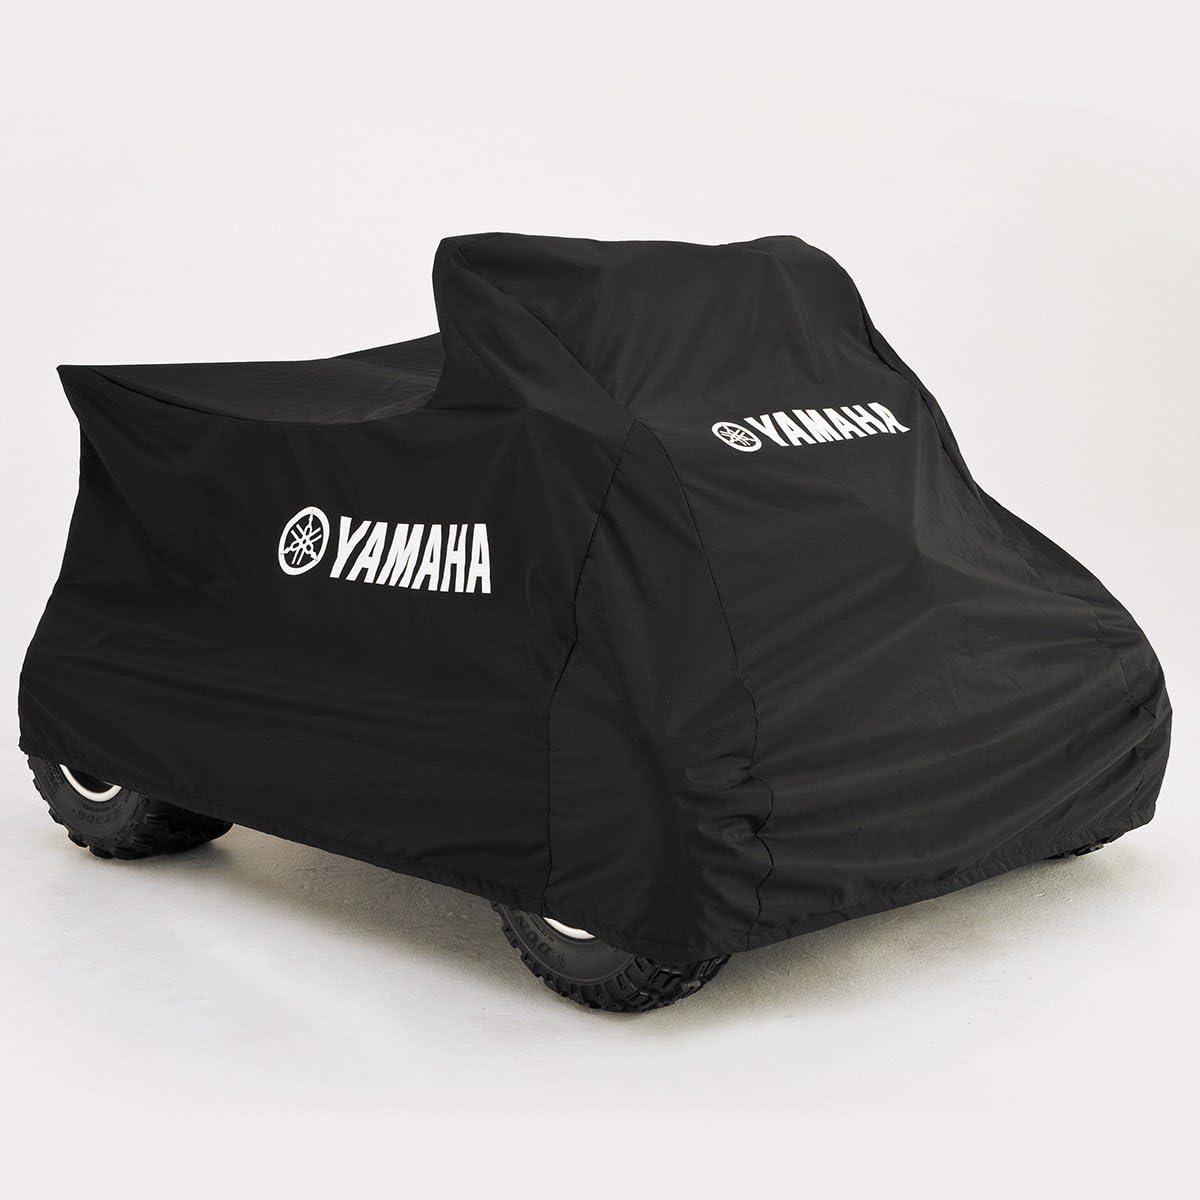 NEW YAMAHA SPORT ATV COVER RAPTOR 125 250 350 700 YFZ450 18P-F81A0-V0-00